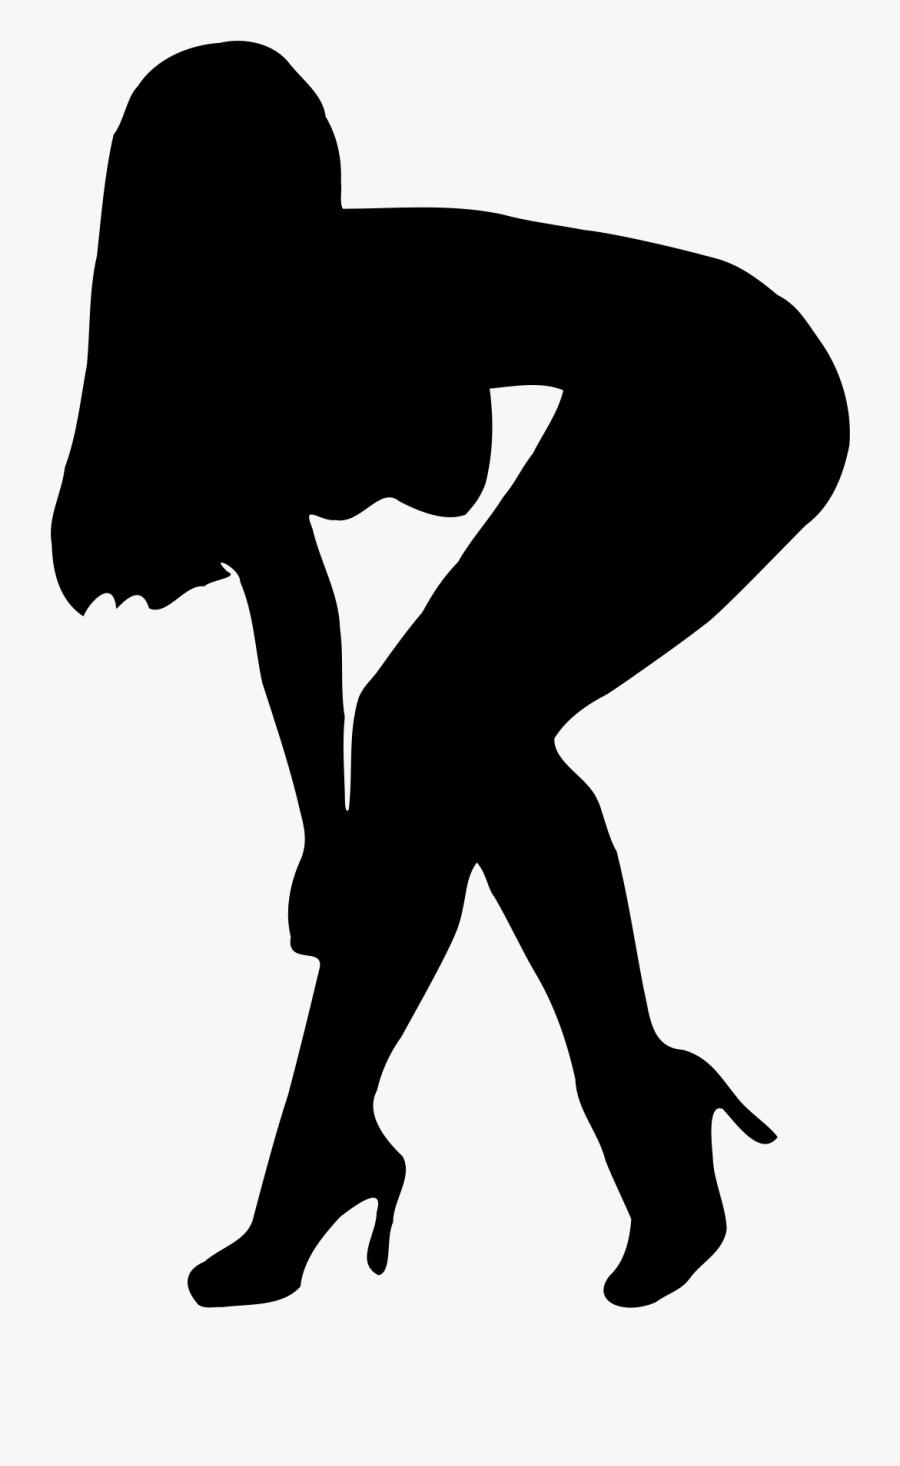 Clipart Woman Thinking - Gas Grass Or Ass Transparent, Transparent Clipart